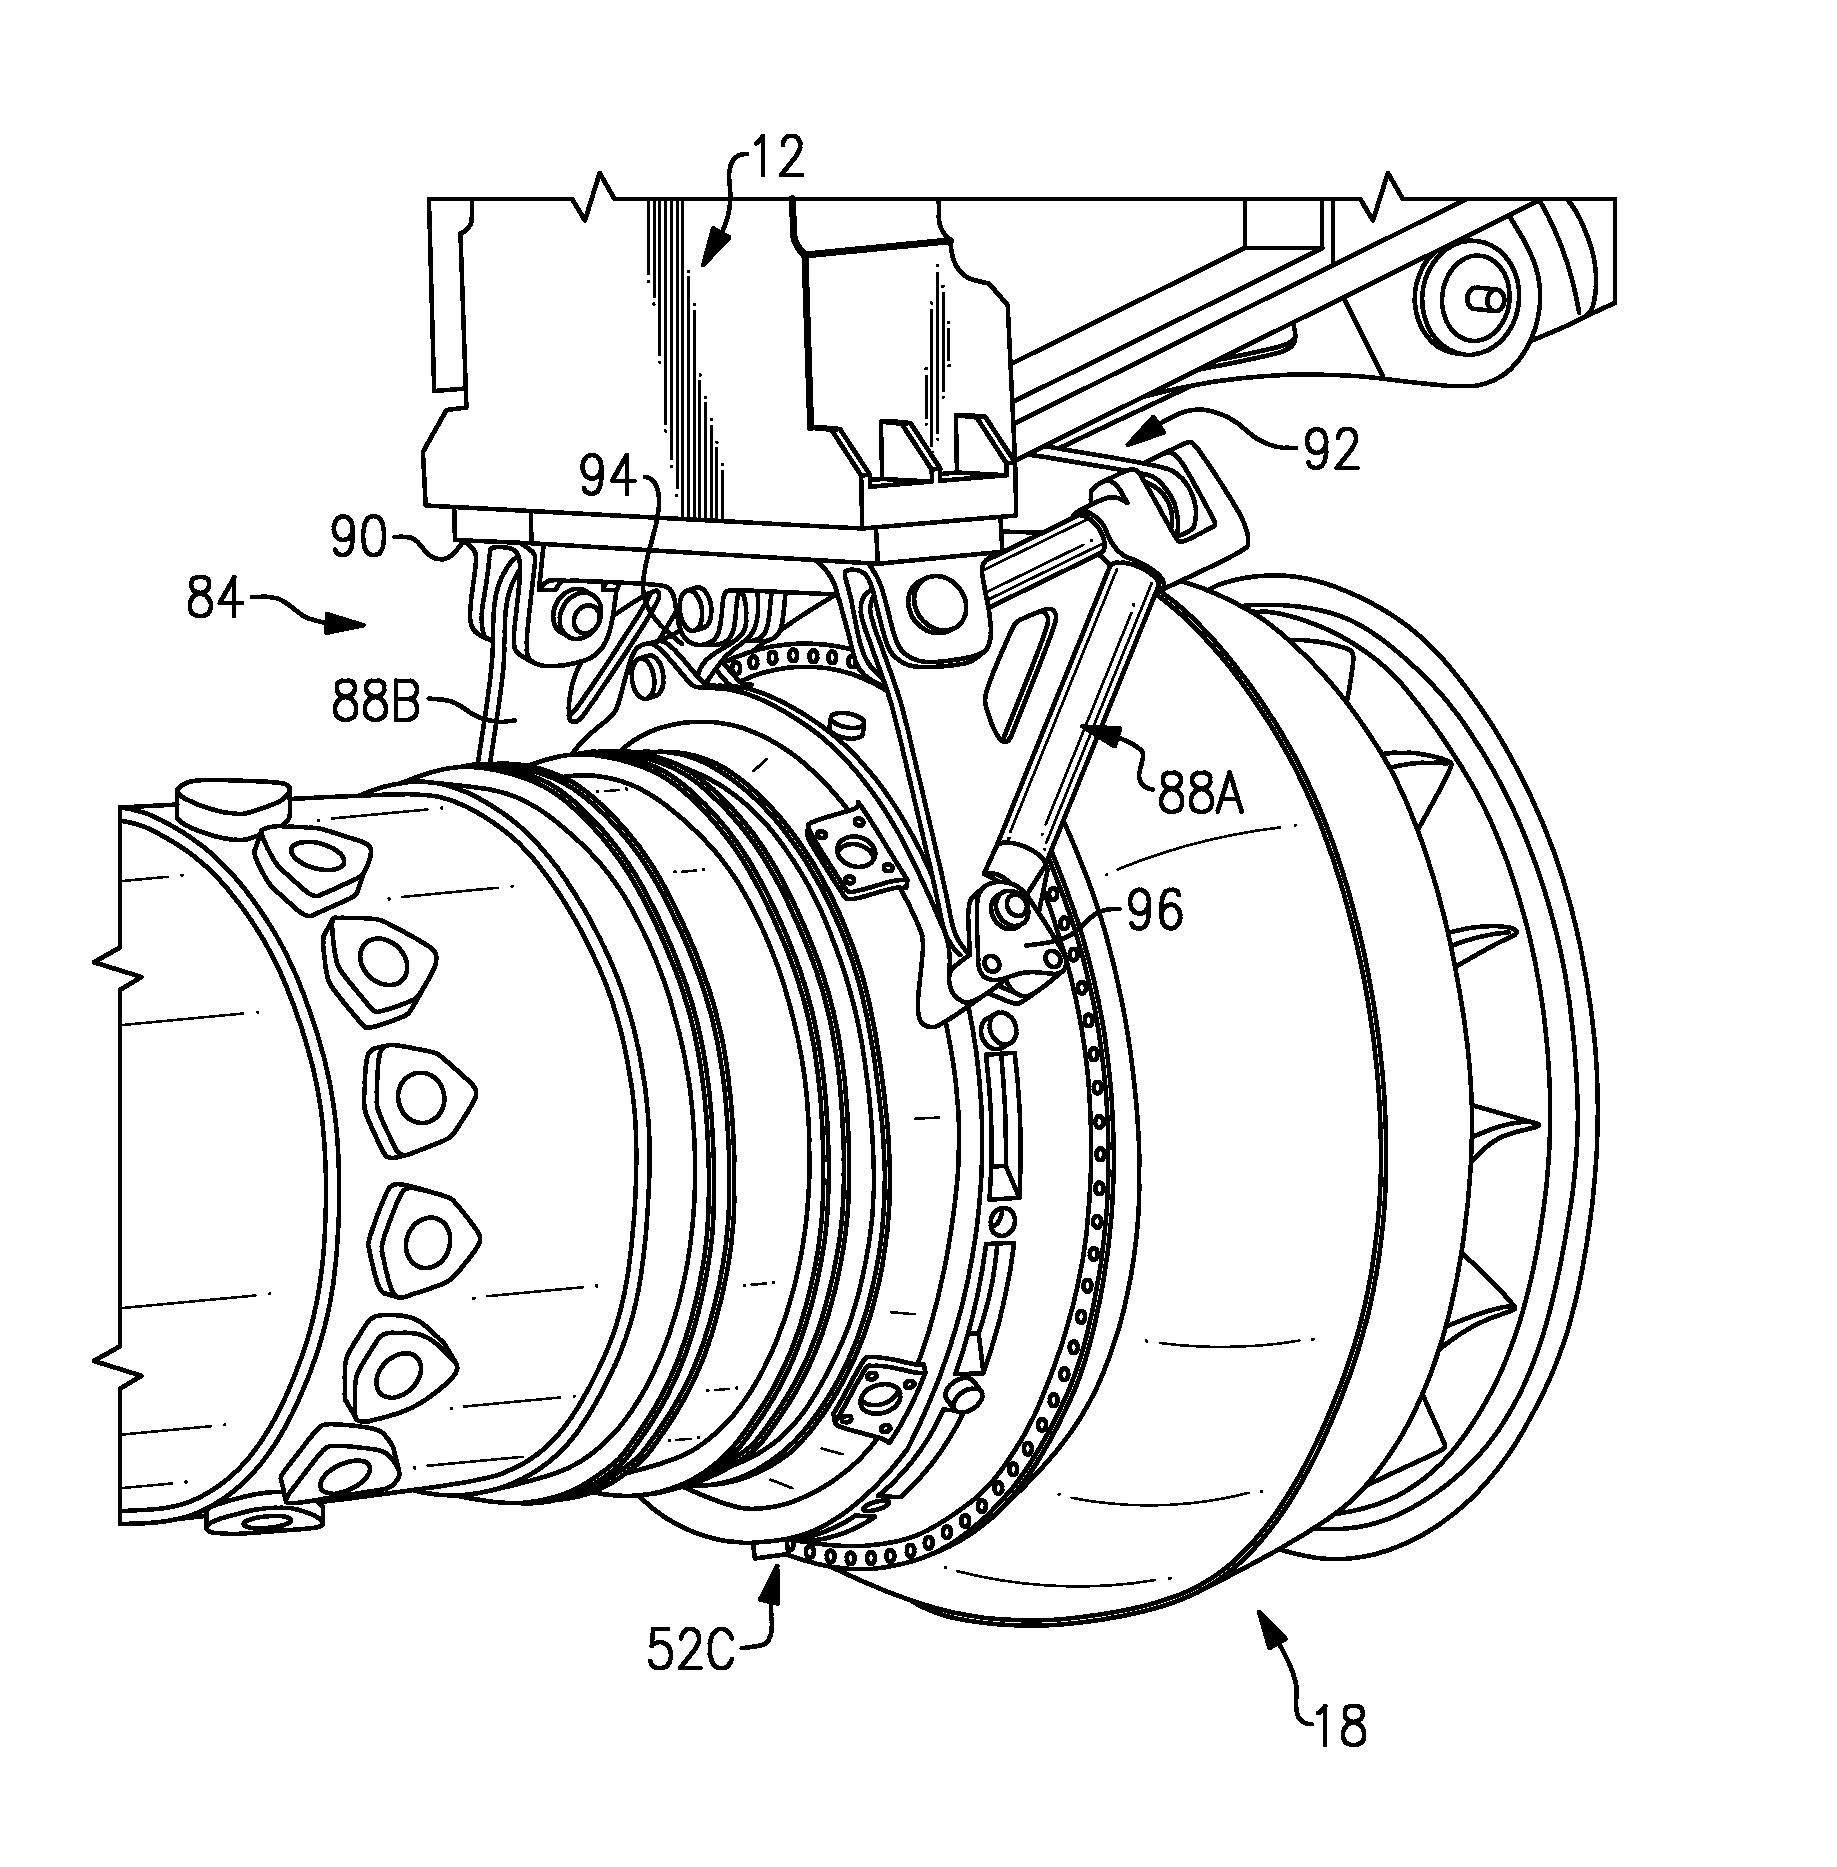 lm2500 gas turbine manual pdf